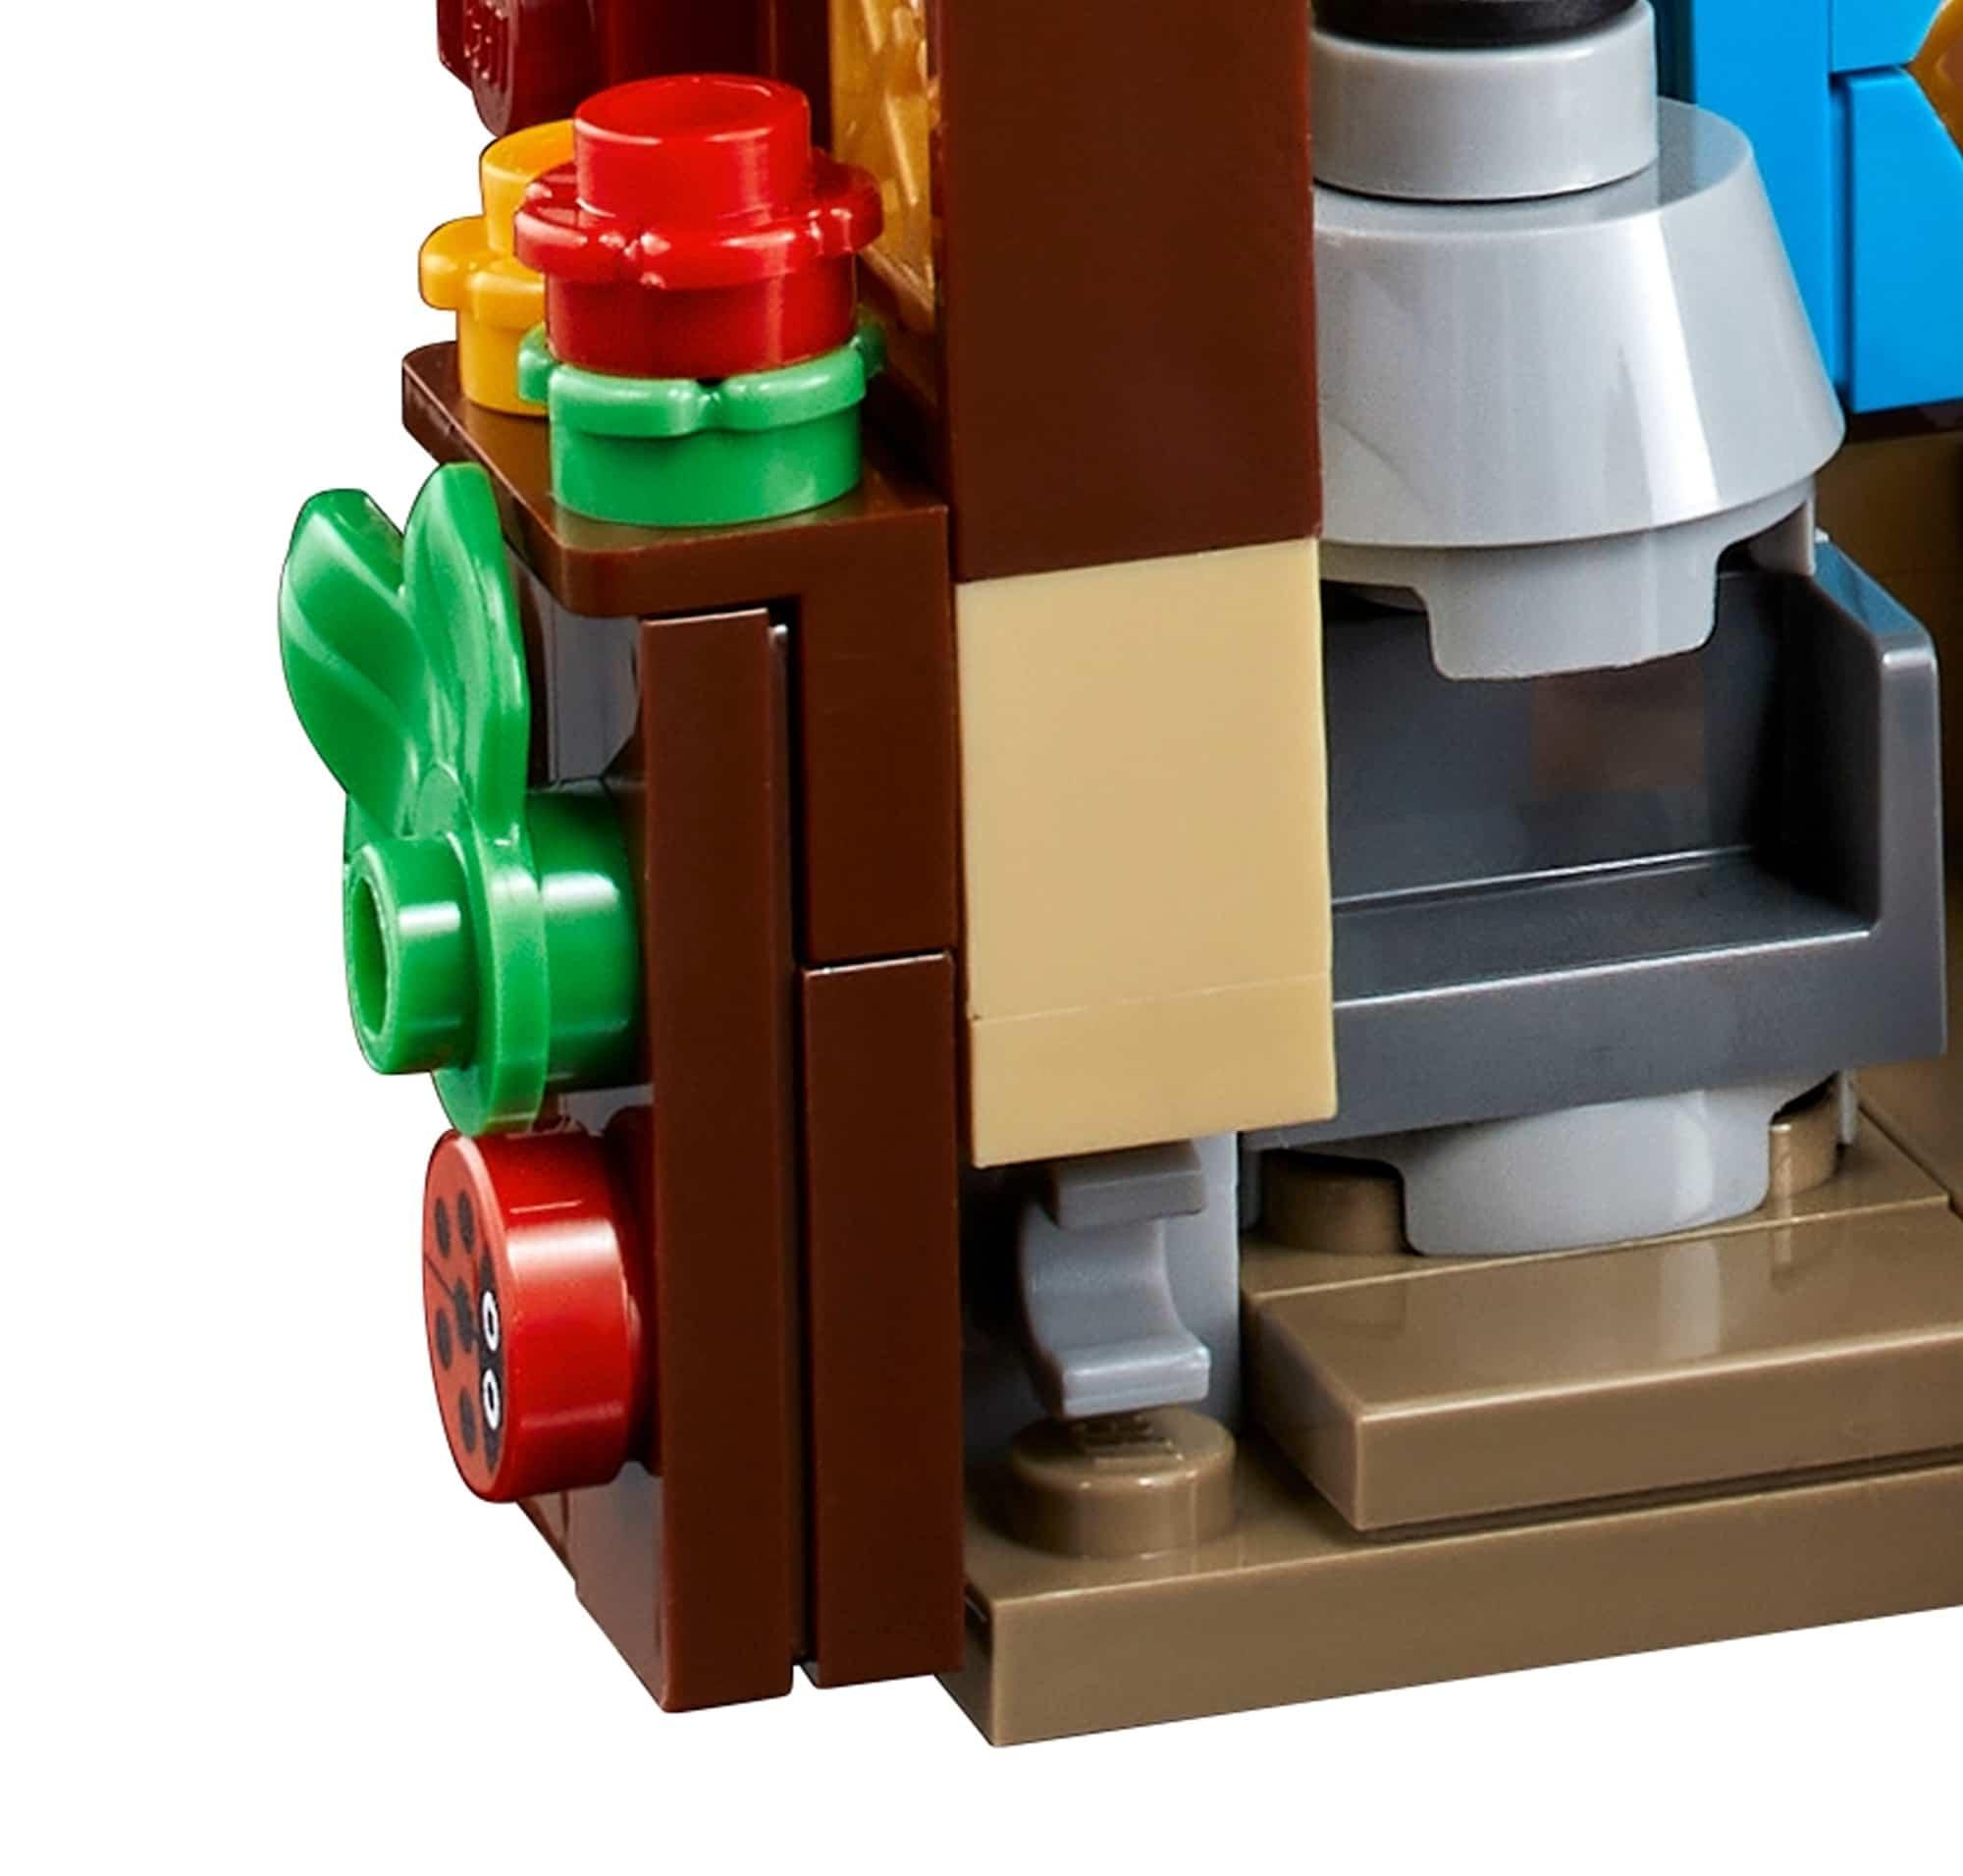 LEGO Ideas 21326 Winnie Pooh Detail 10